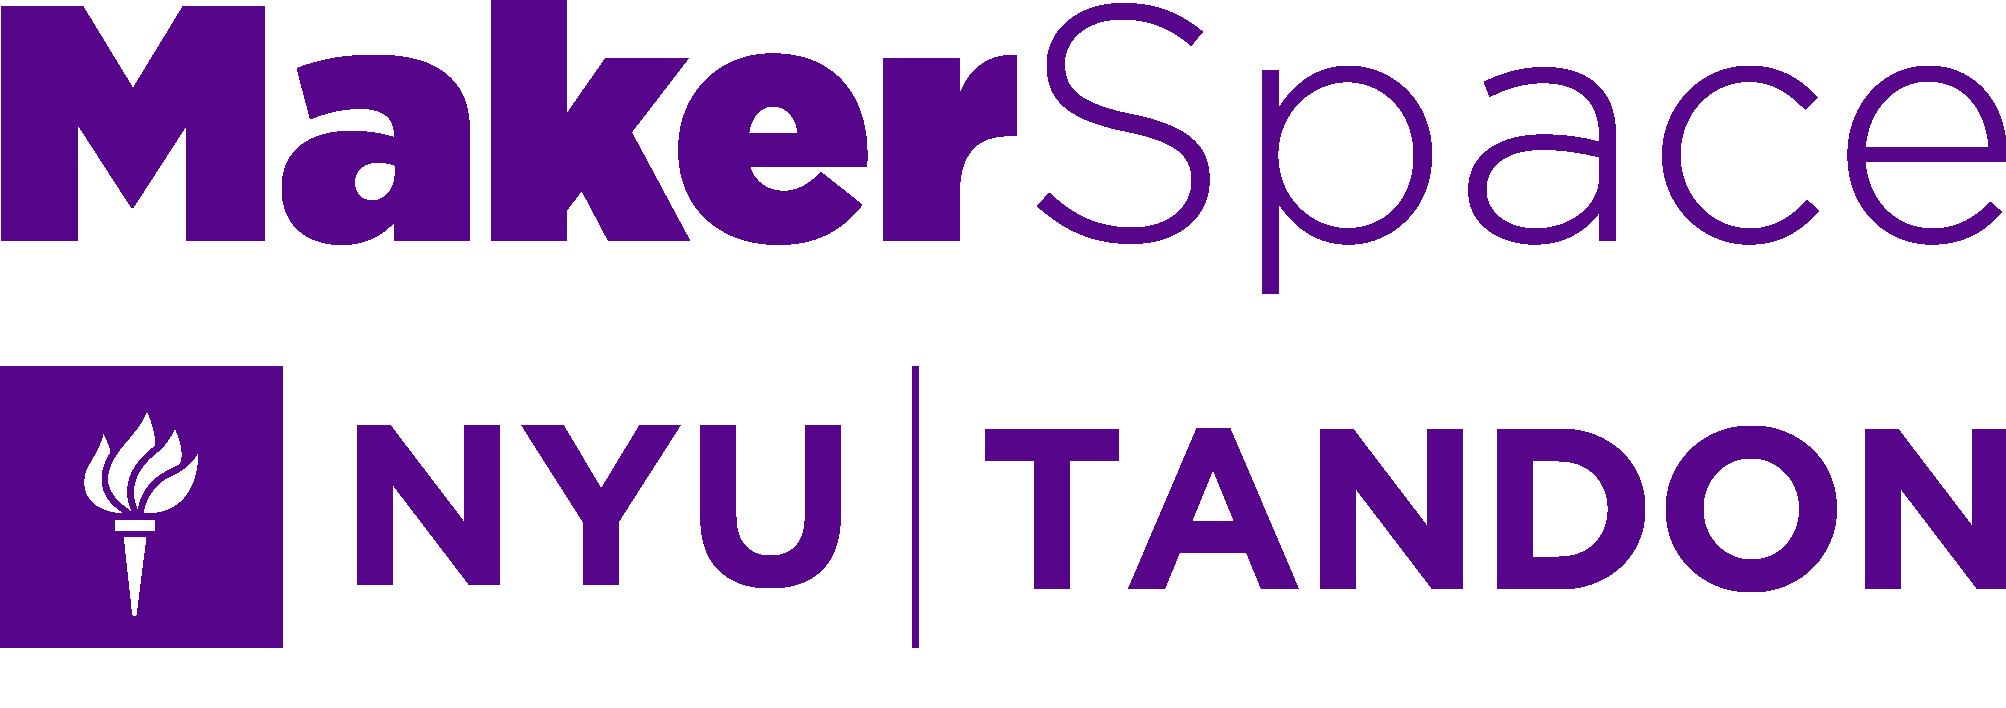 MakerSpace NYU Tandon Logo